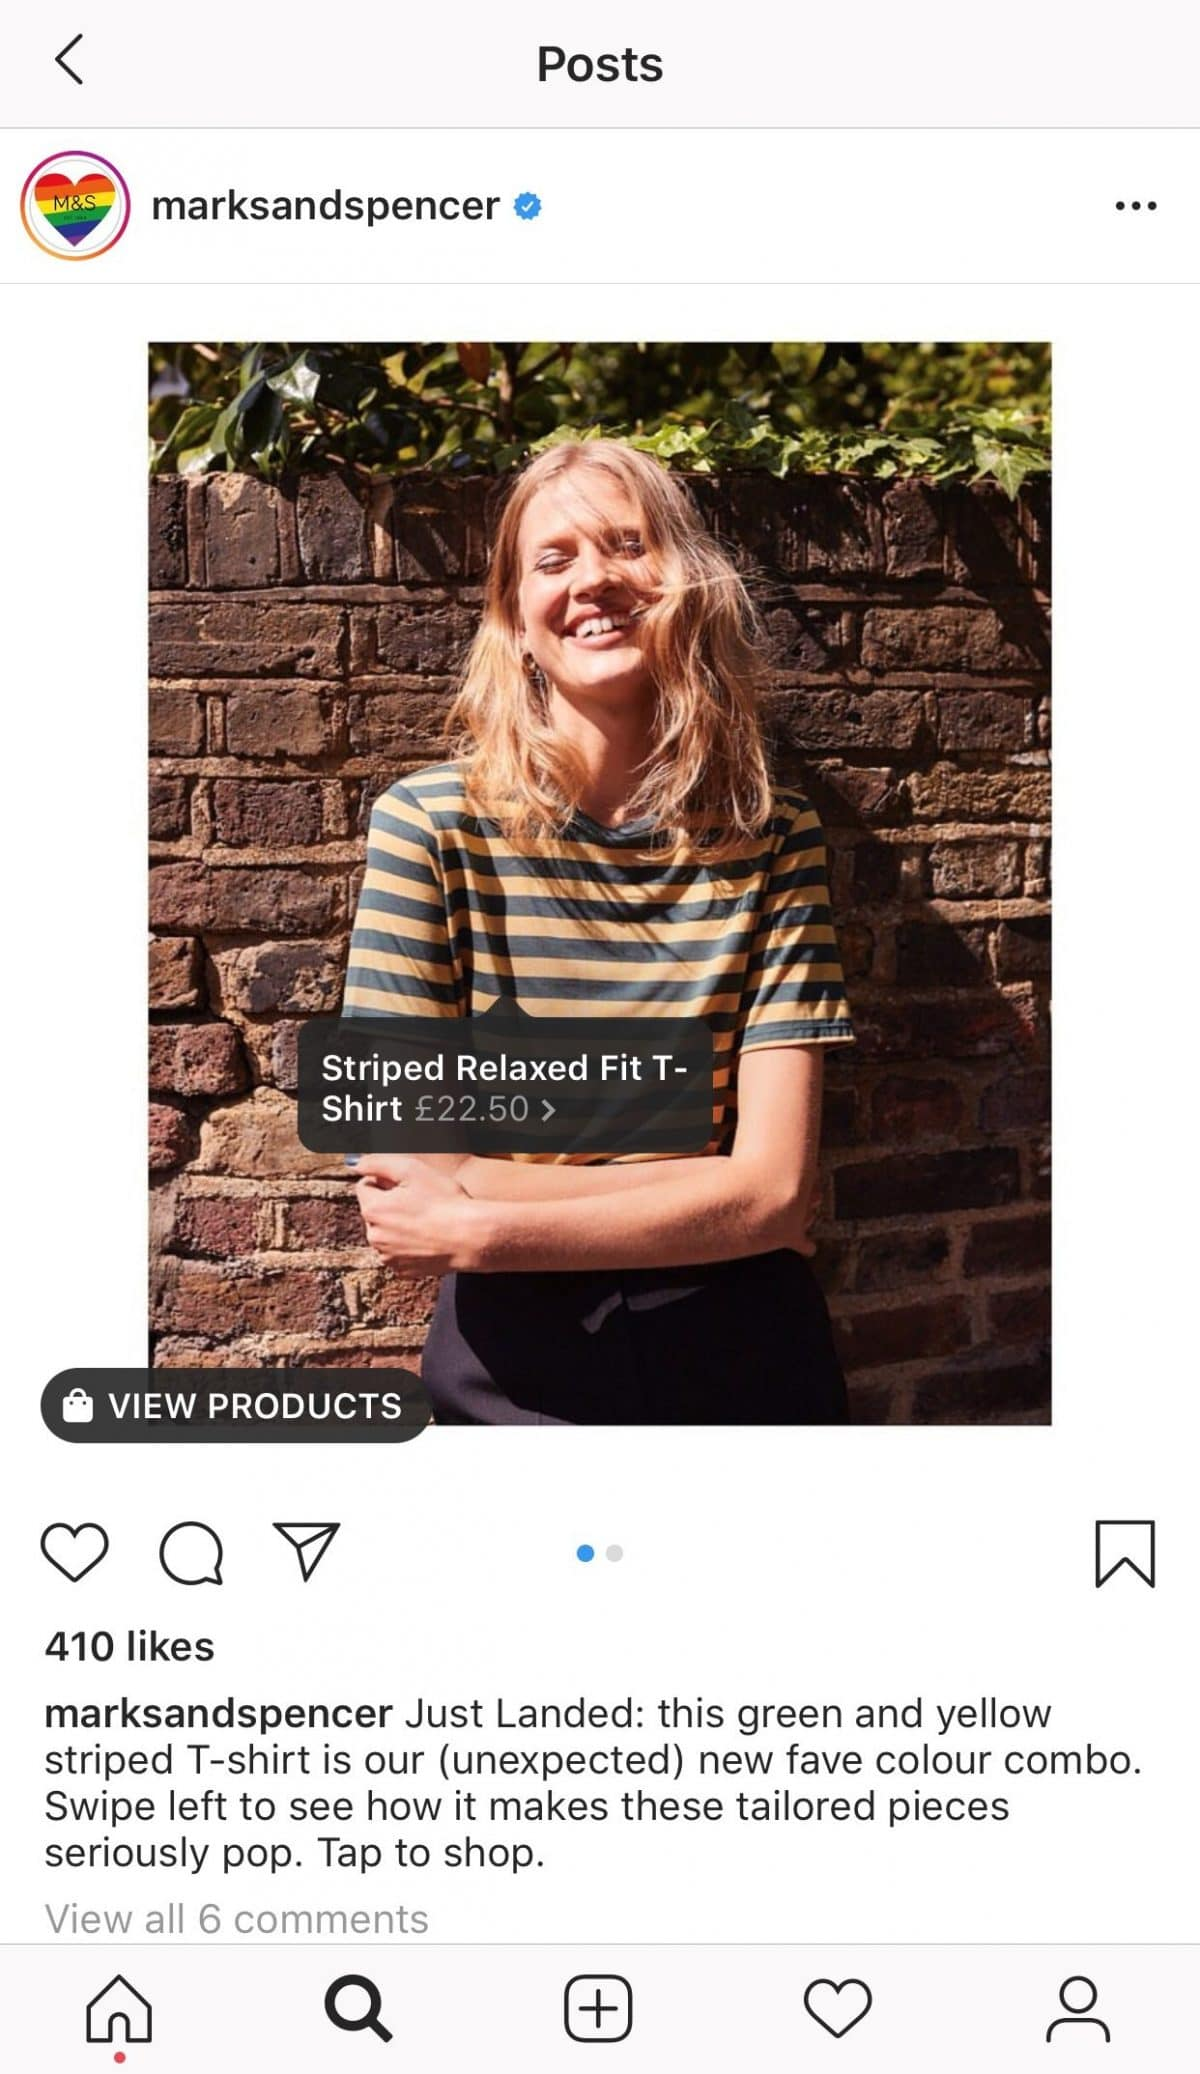 Insta-shopping Instagram